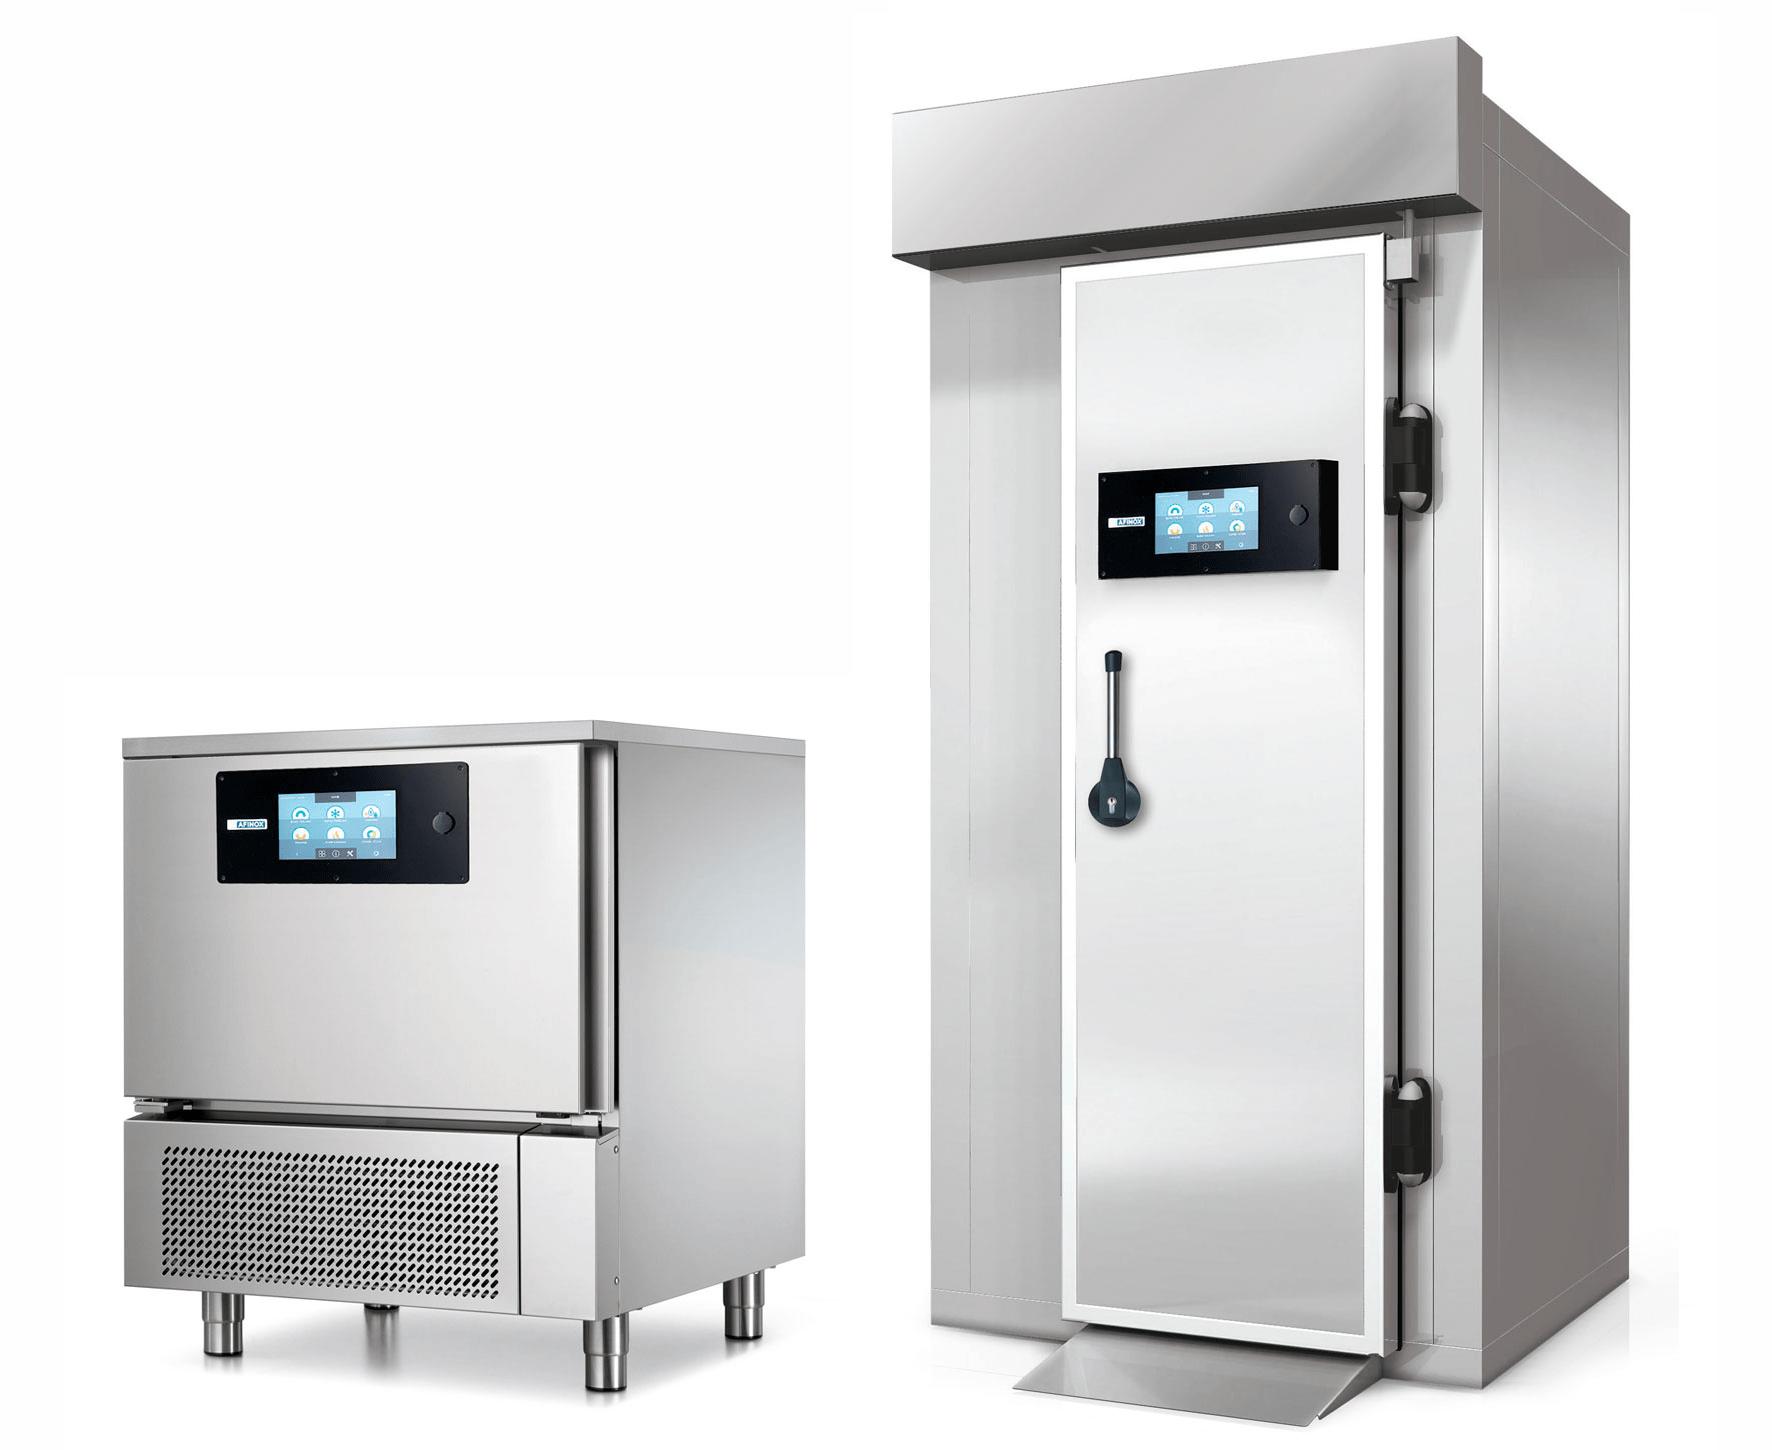 abbattitori e surgelatori rapidi di temperatura, blast chillers and shock freezers, Abatidores y congeladores rapidos, Schnellabkühler und schockfroster, cellules de refroidissement rapide